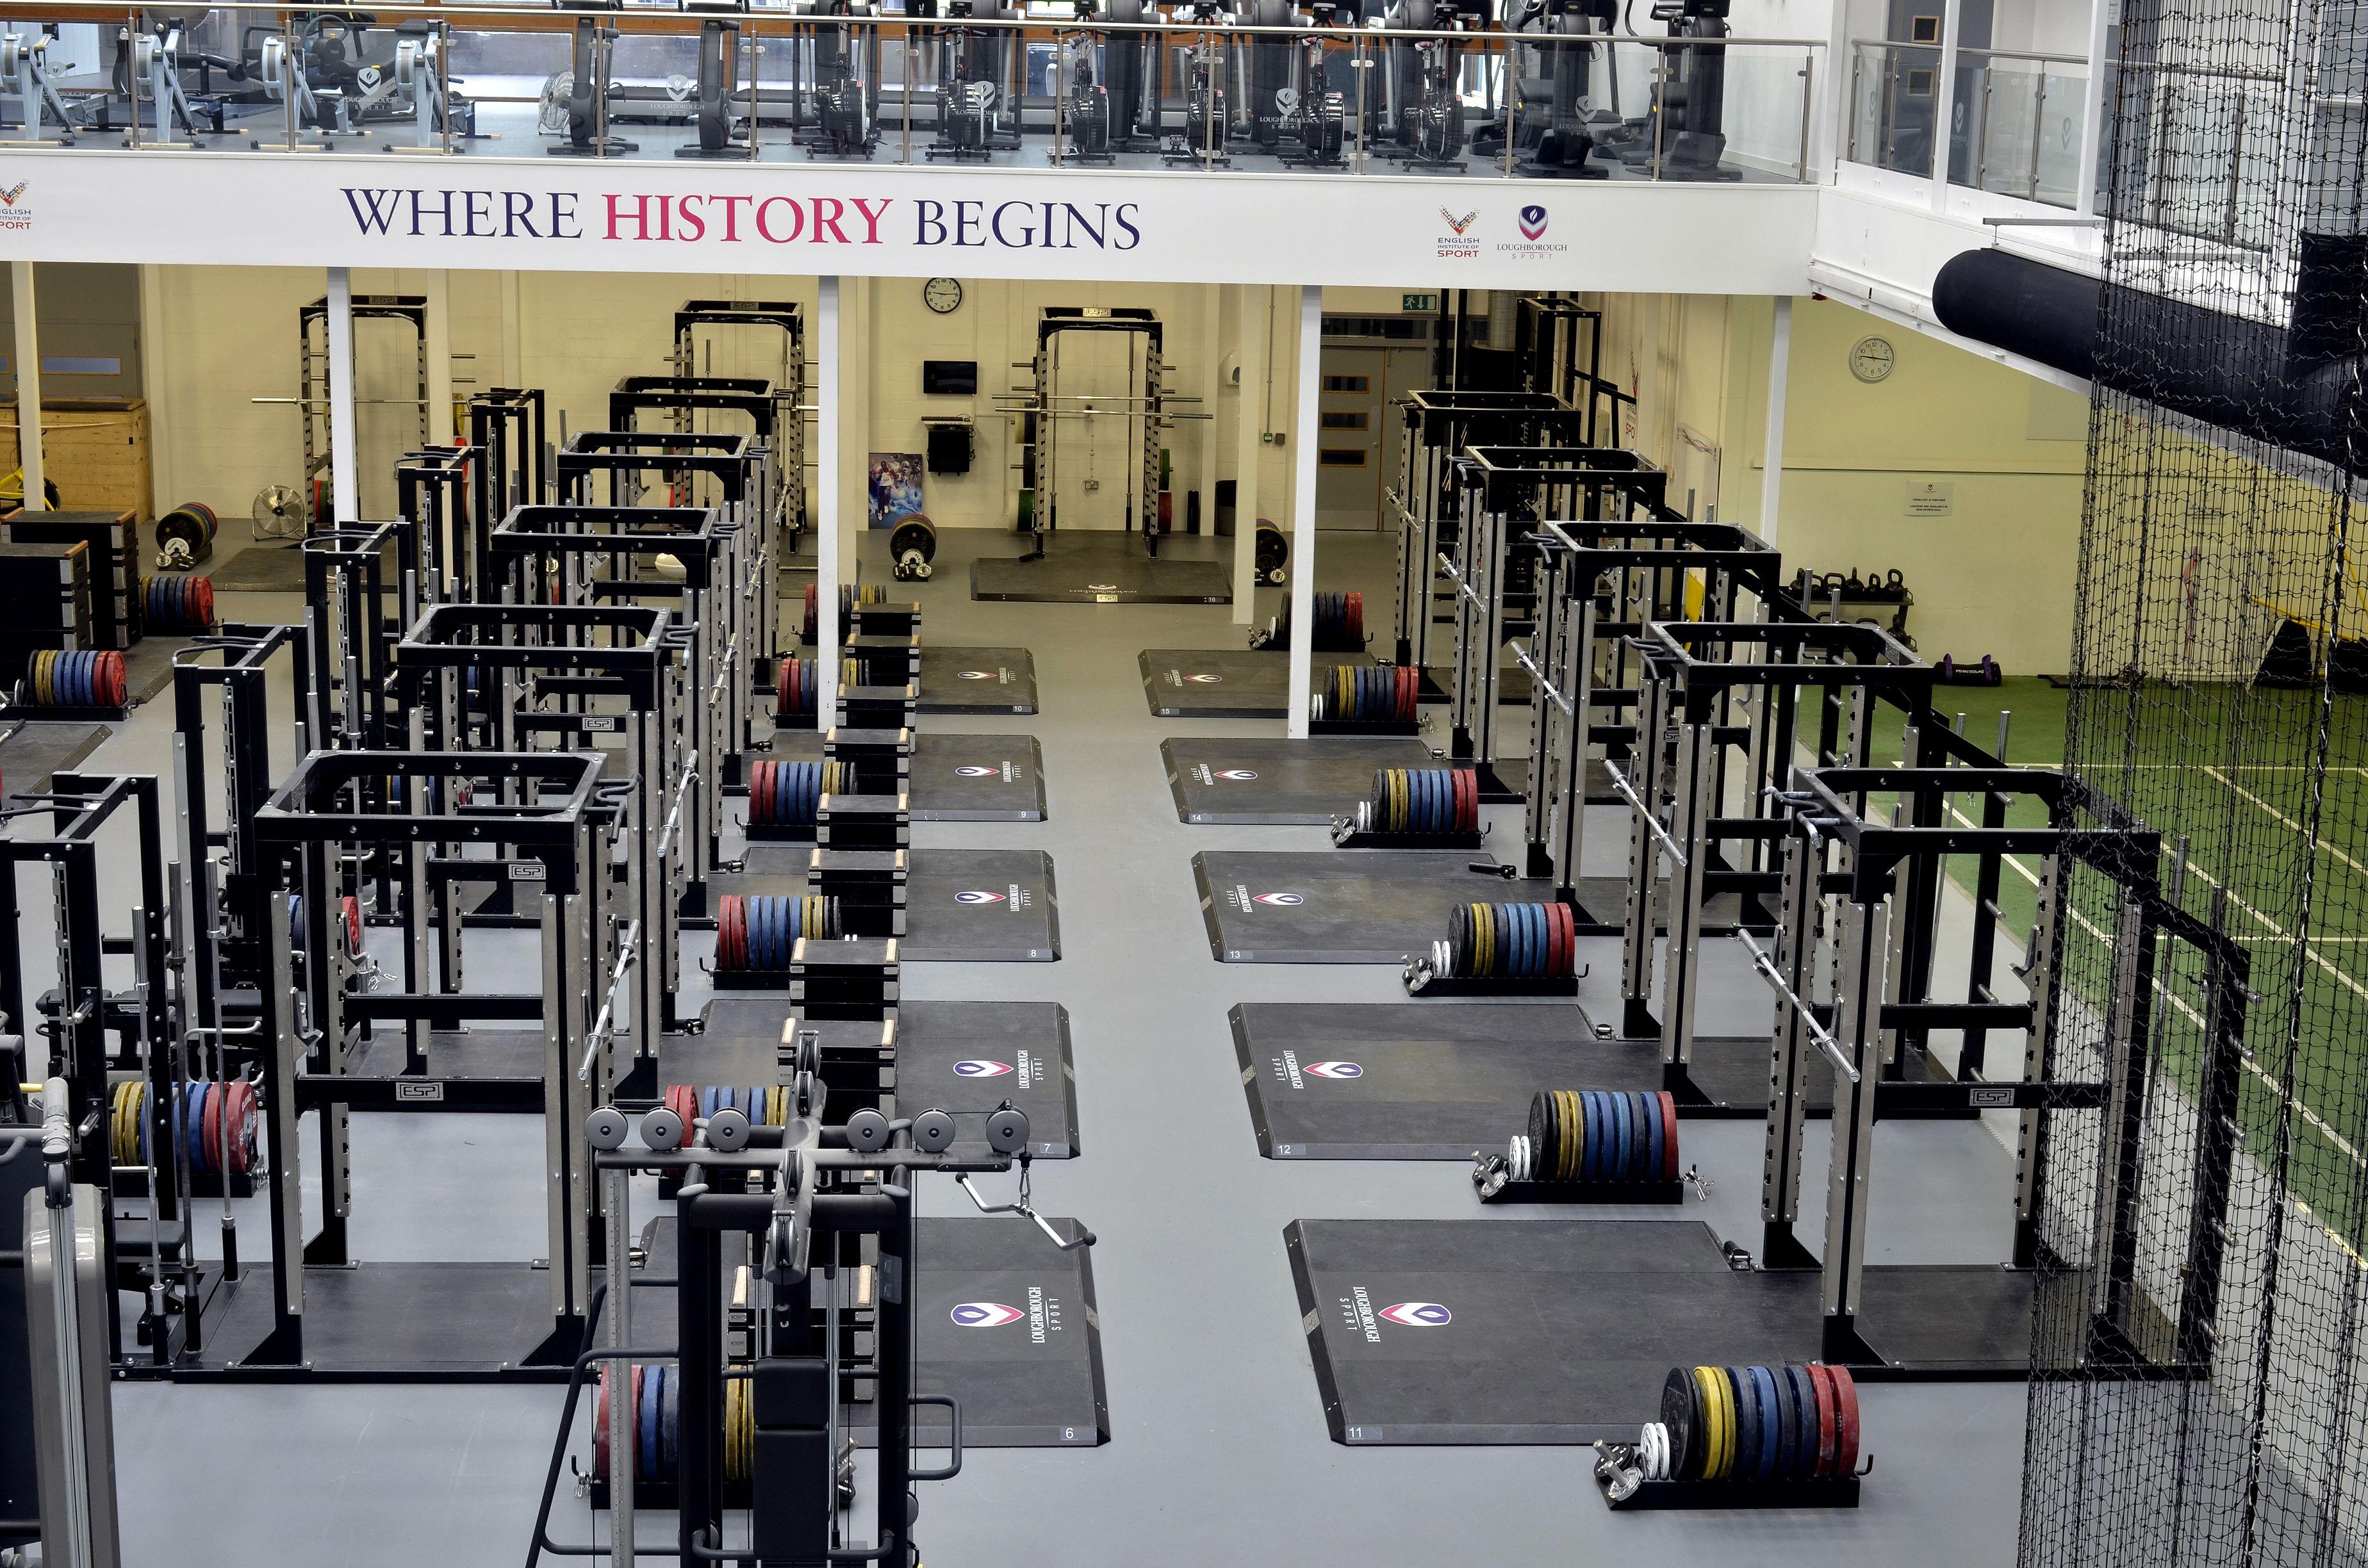 Loughborough University Gym design, Power rack, Fitness